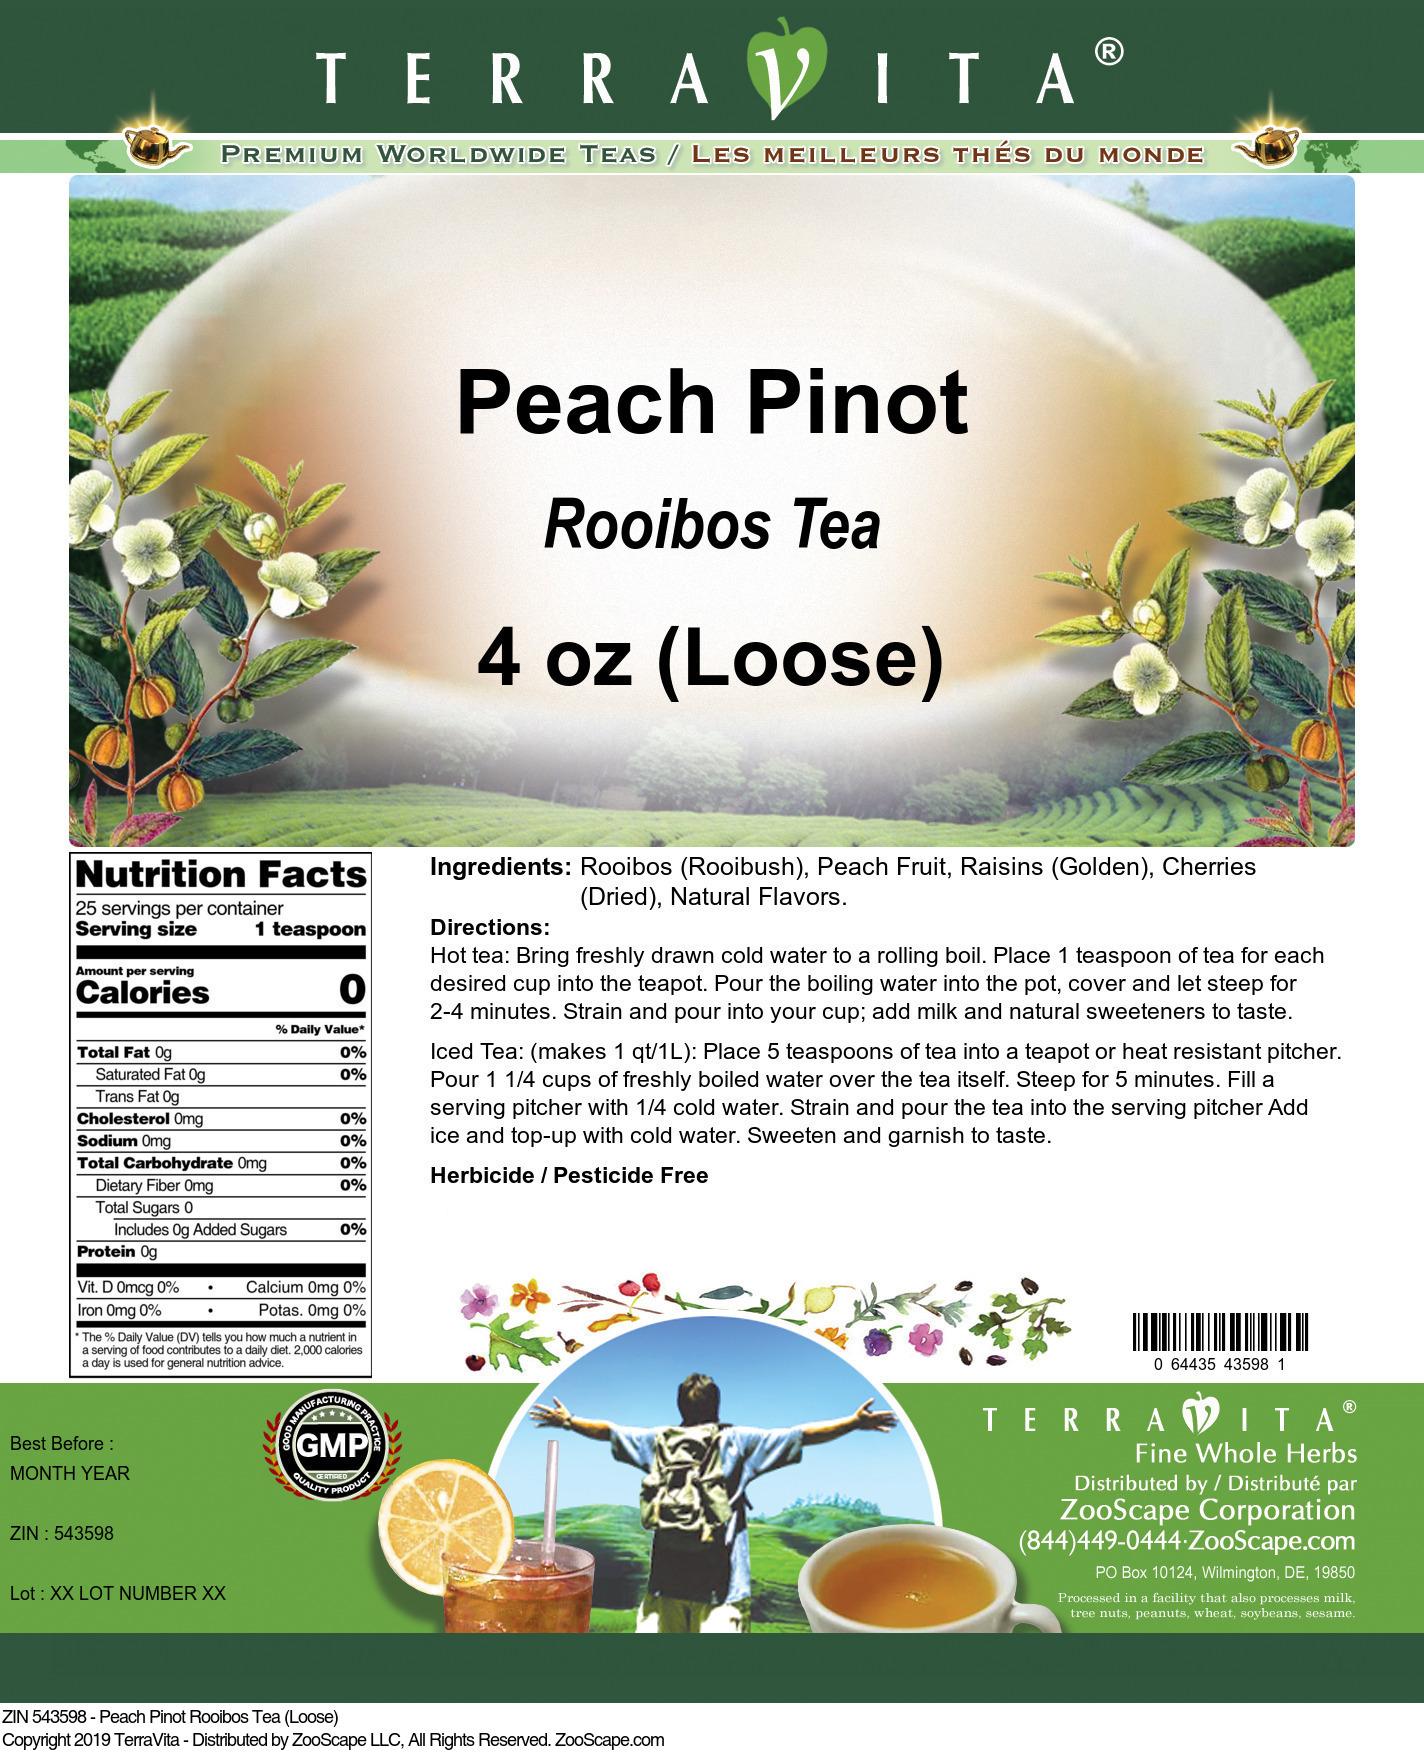 Peach Pinot Rooibos Tea (Loose)